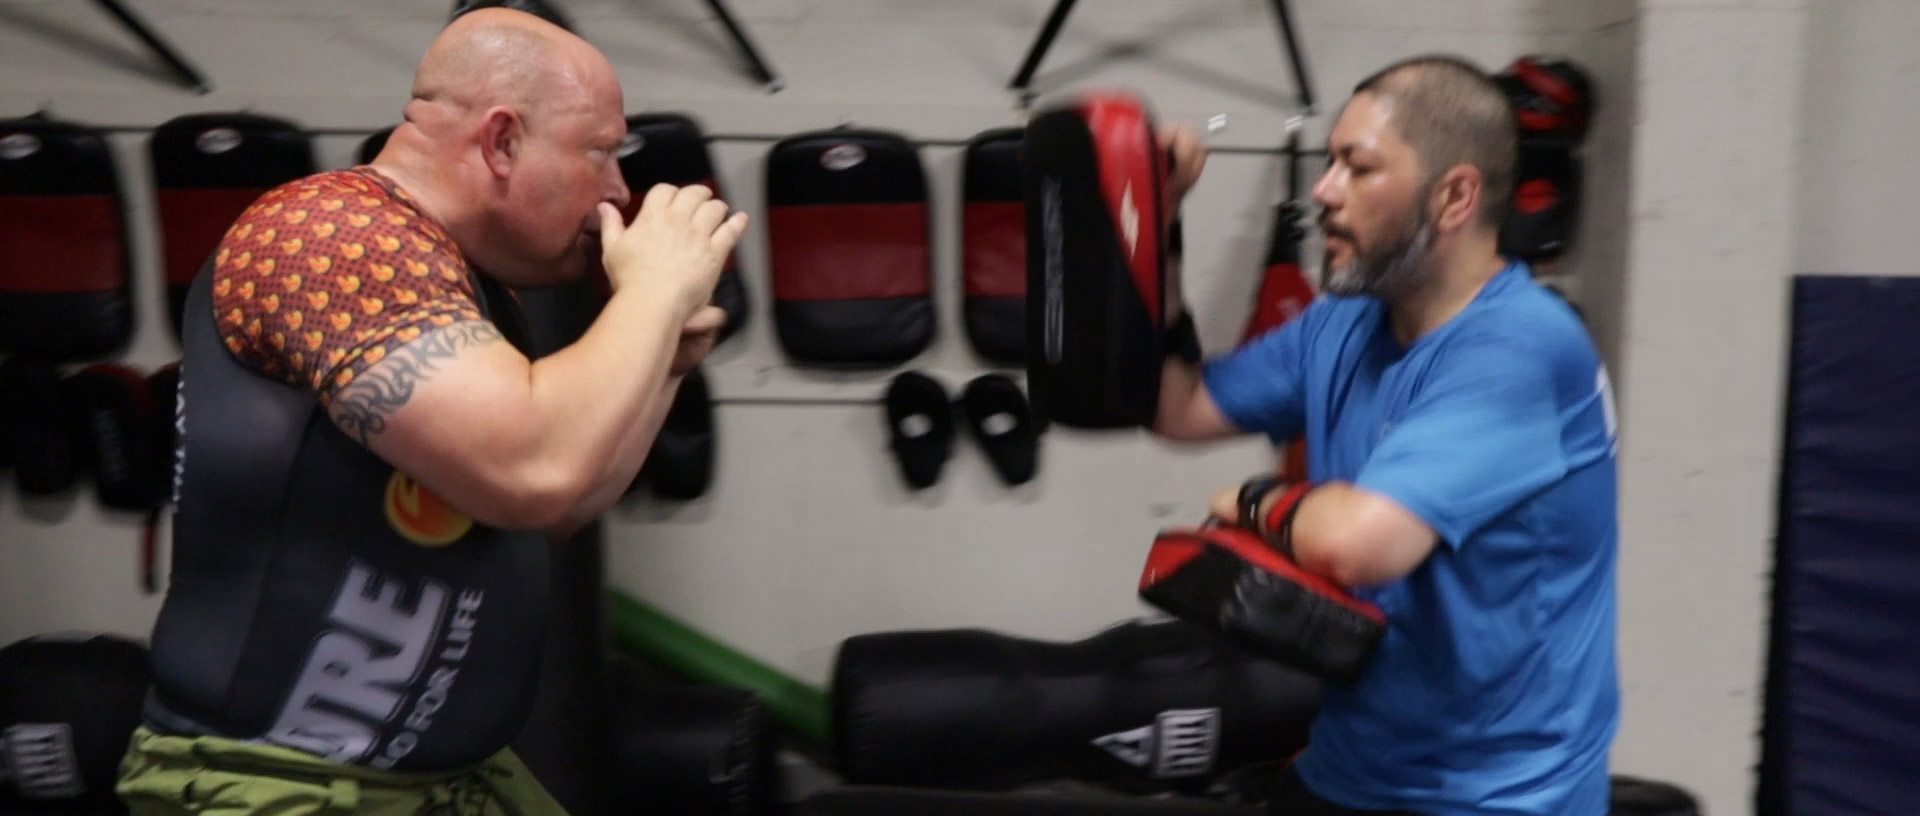 Self Defense MMA Danbury CT